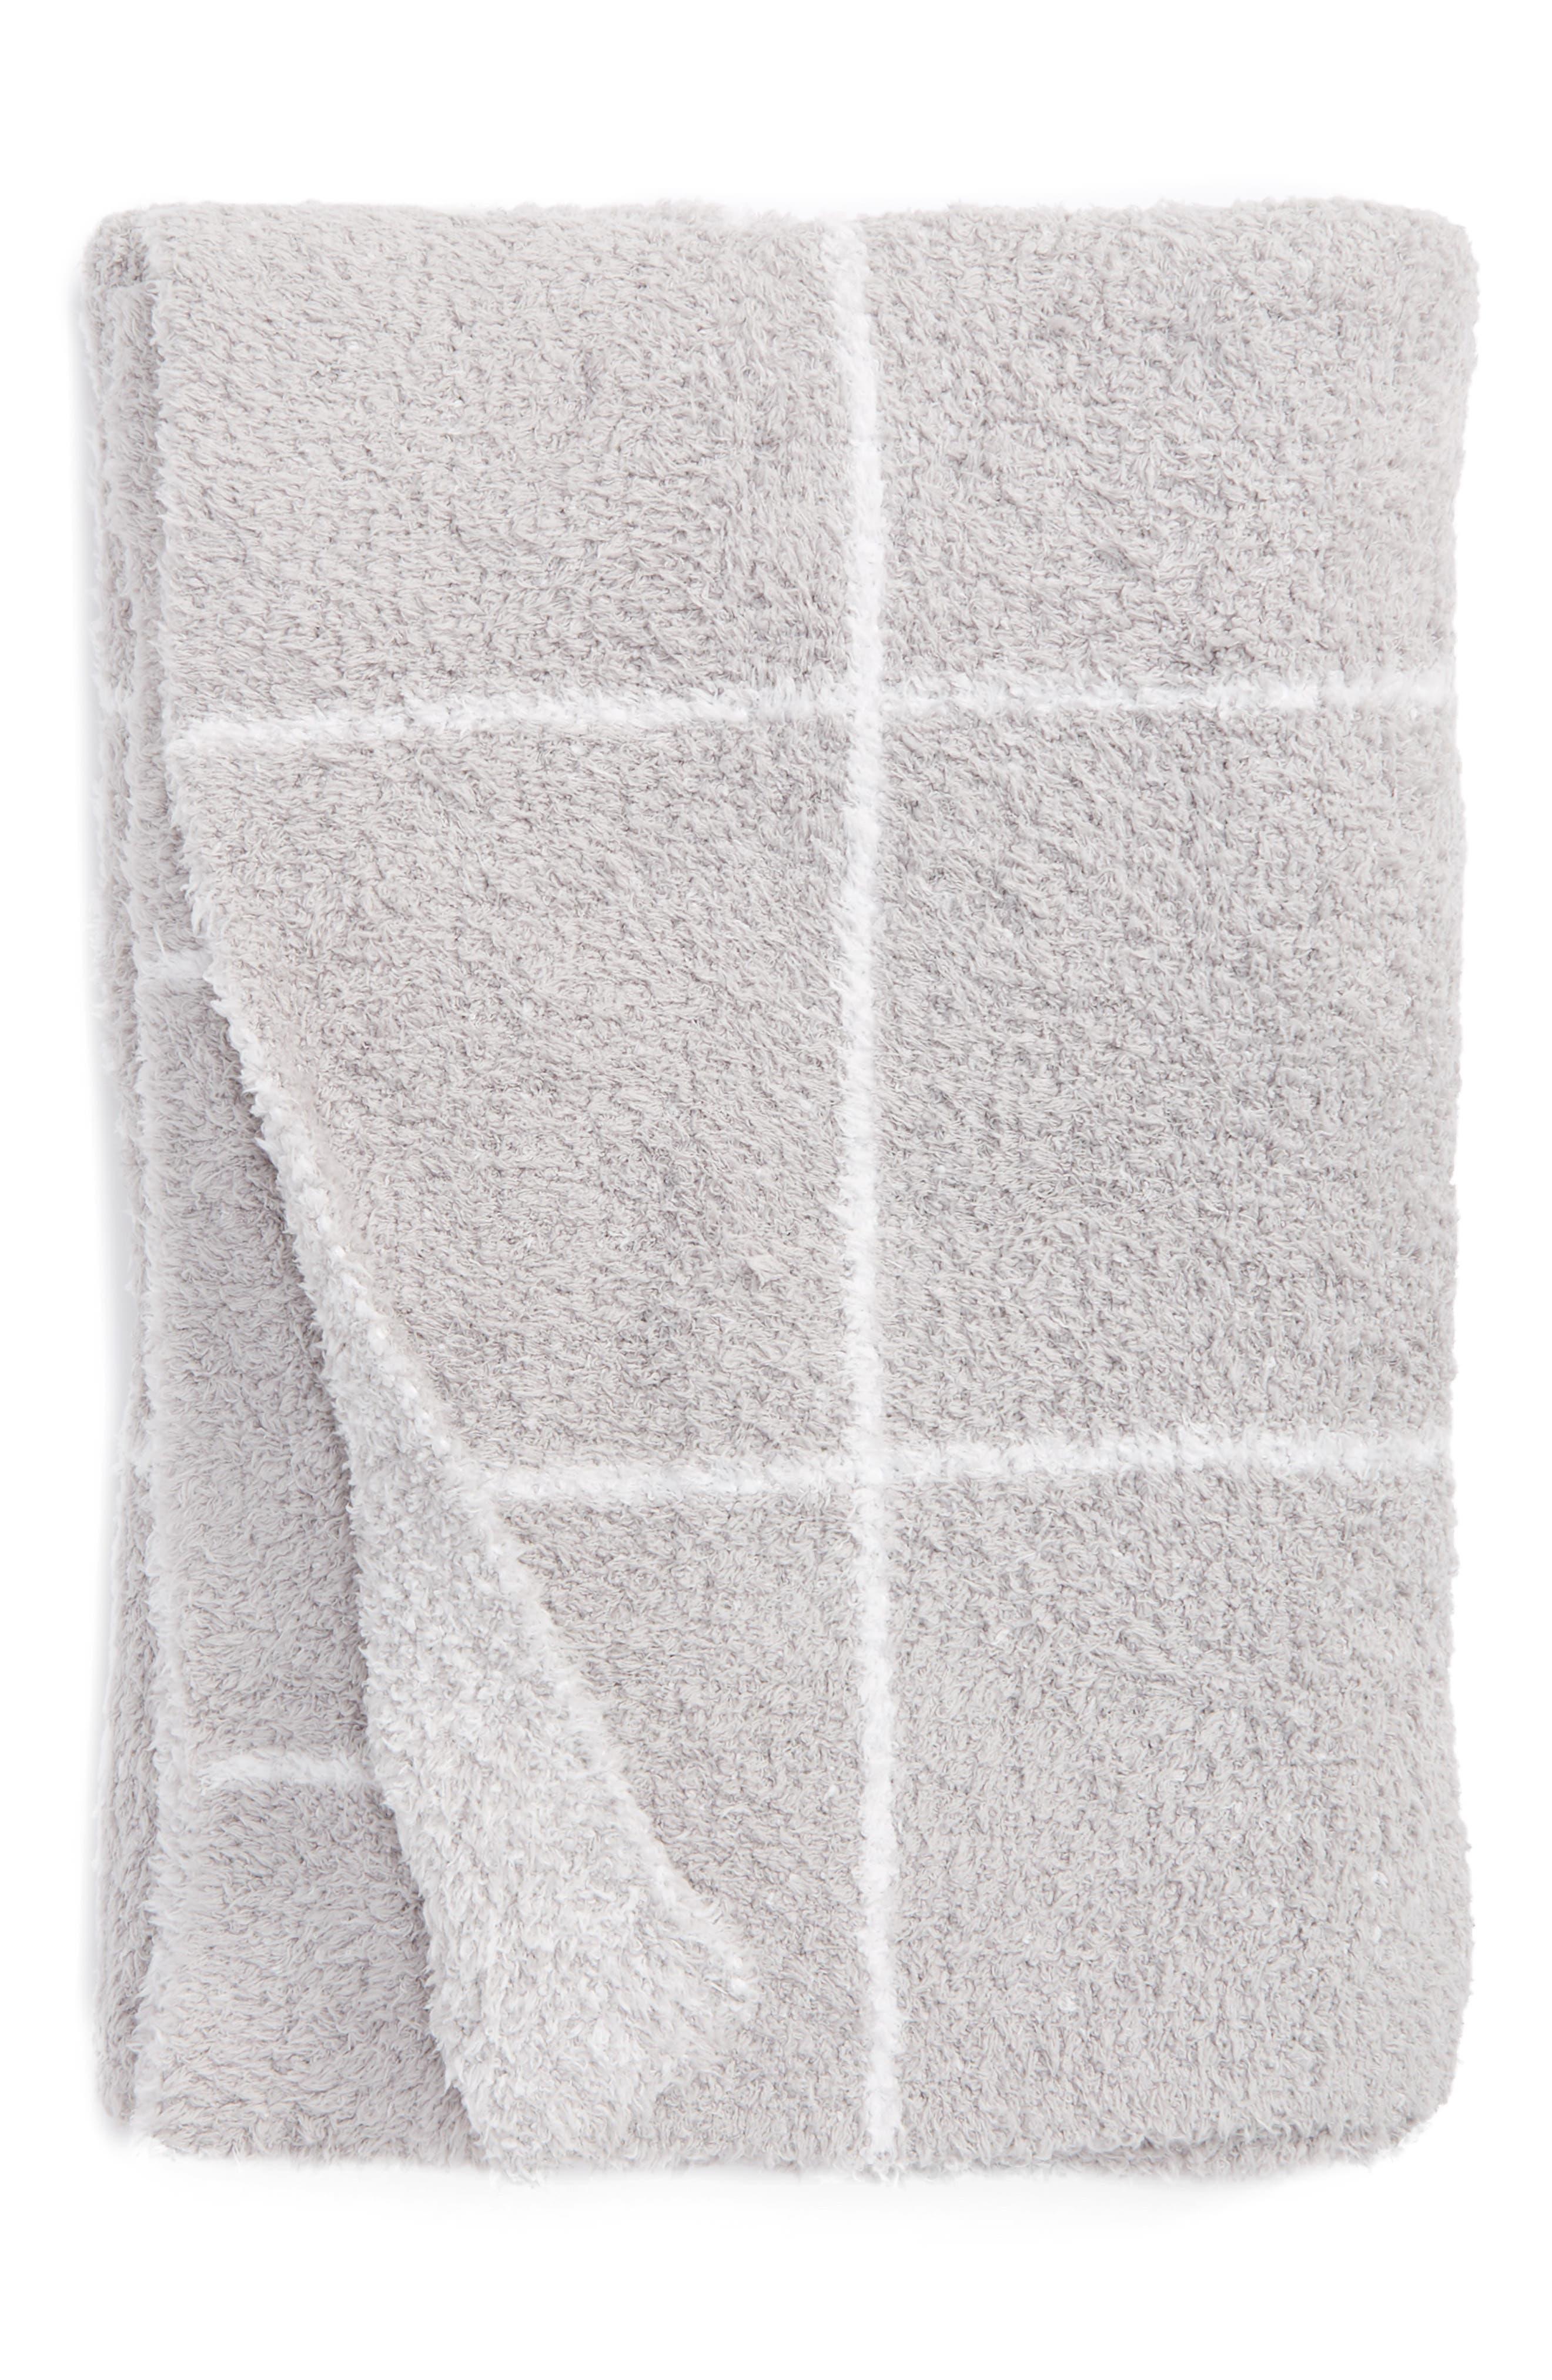 Alternate Image 1 Selected - Barefoot Dreams® Cozychic® Windowpane Plaid Throw Blanket